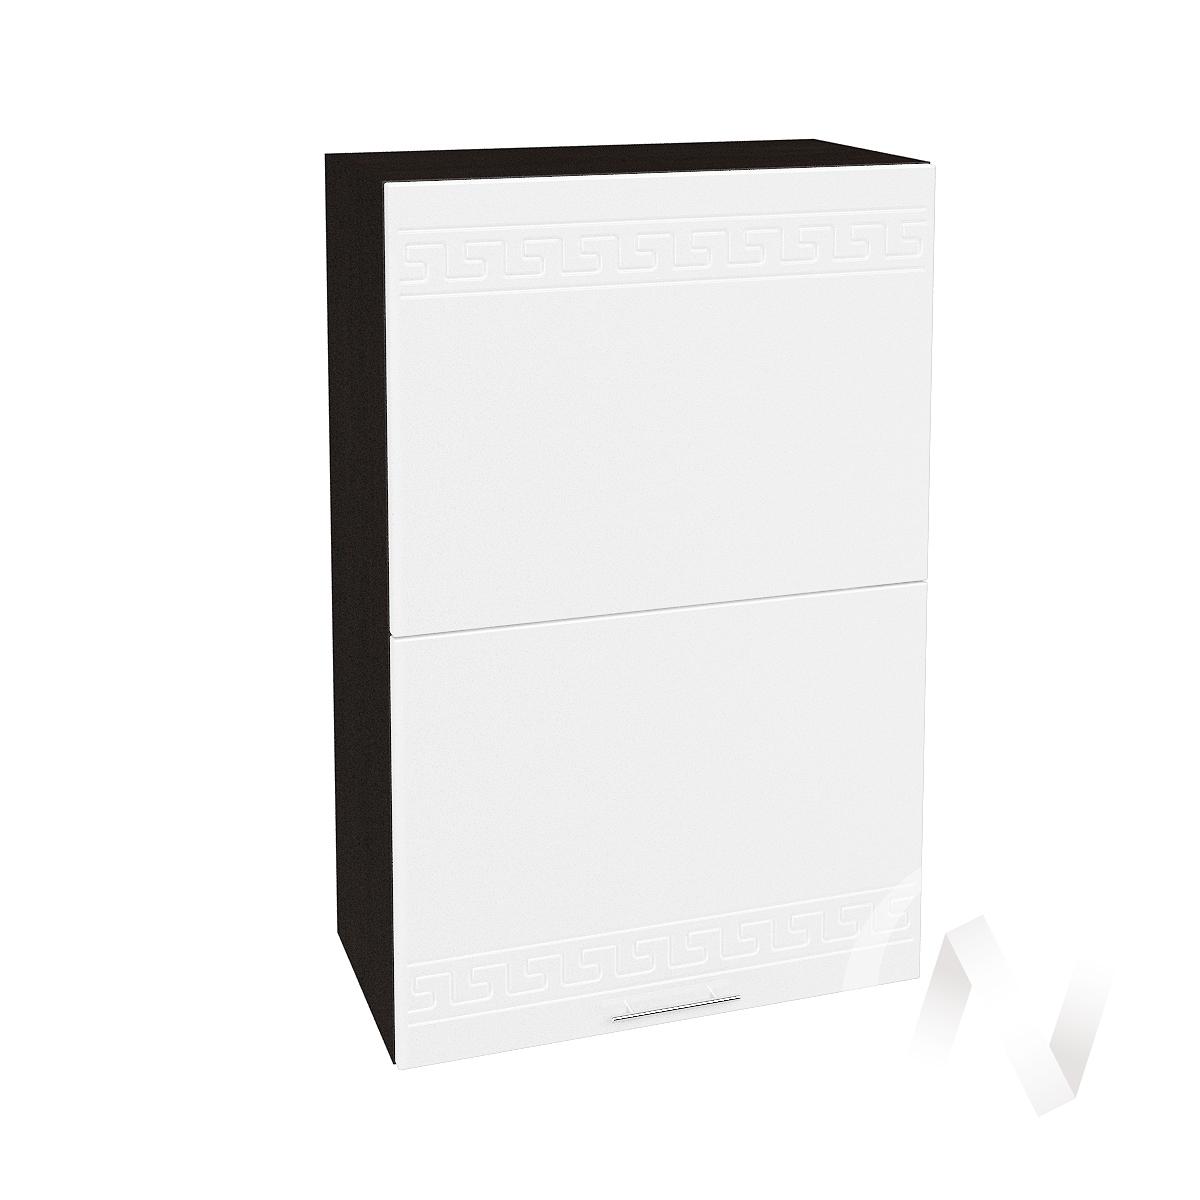 "Кухня ""Греция"": Шкаф верхний горизонтальный 602, ШВГ 602 (белый металлик/корпус венге)"